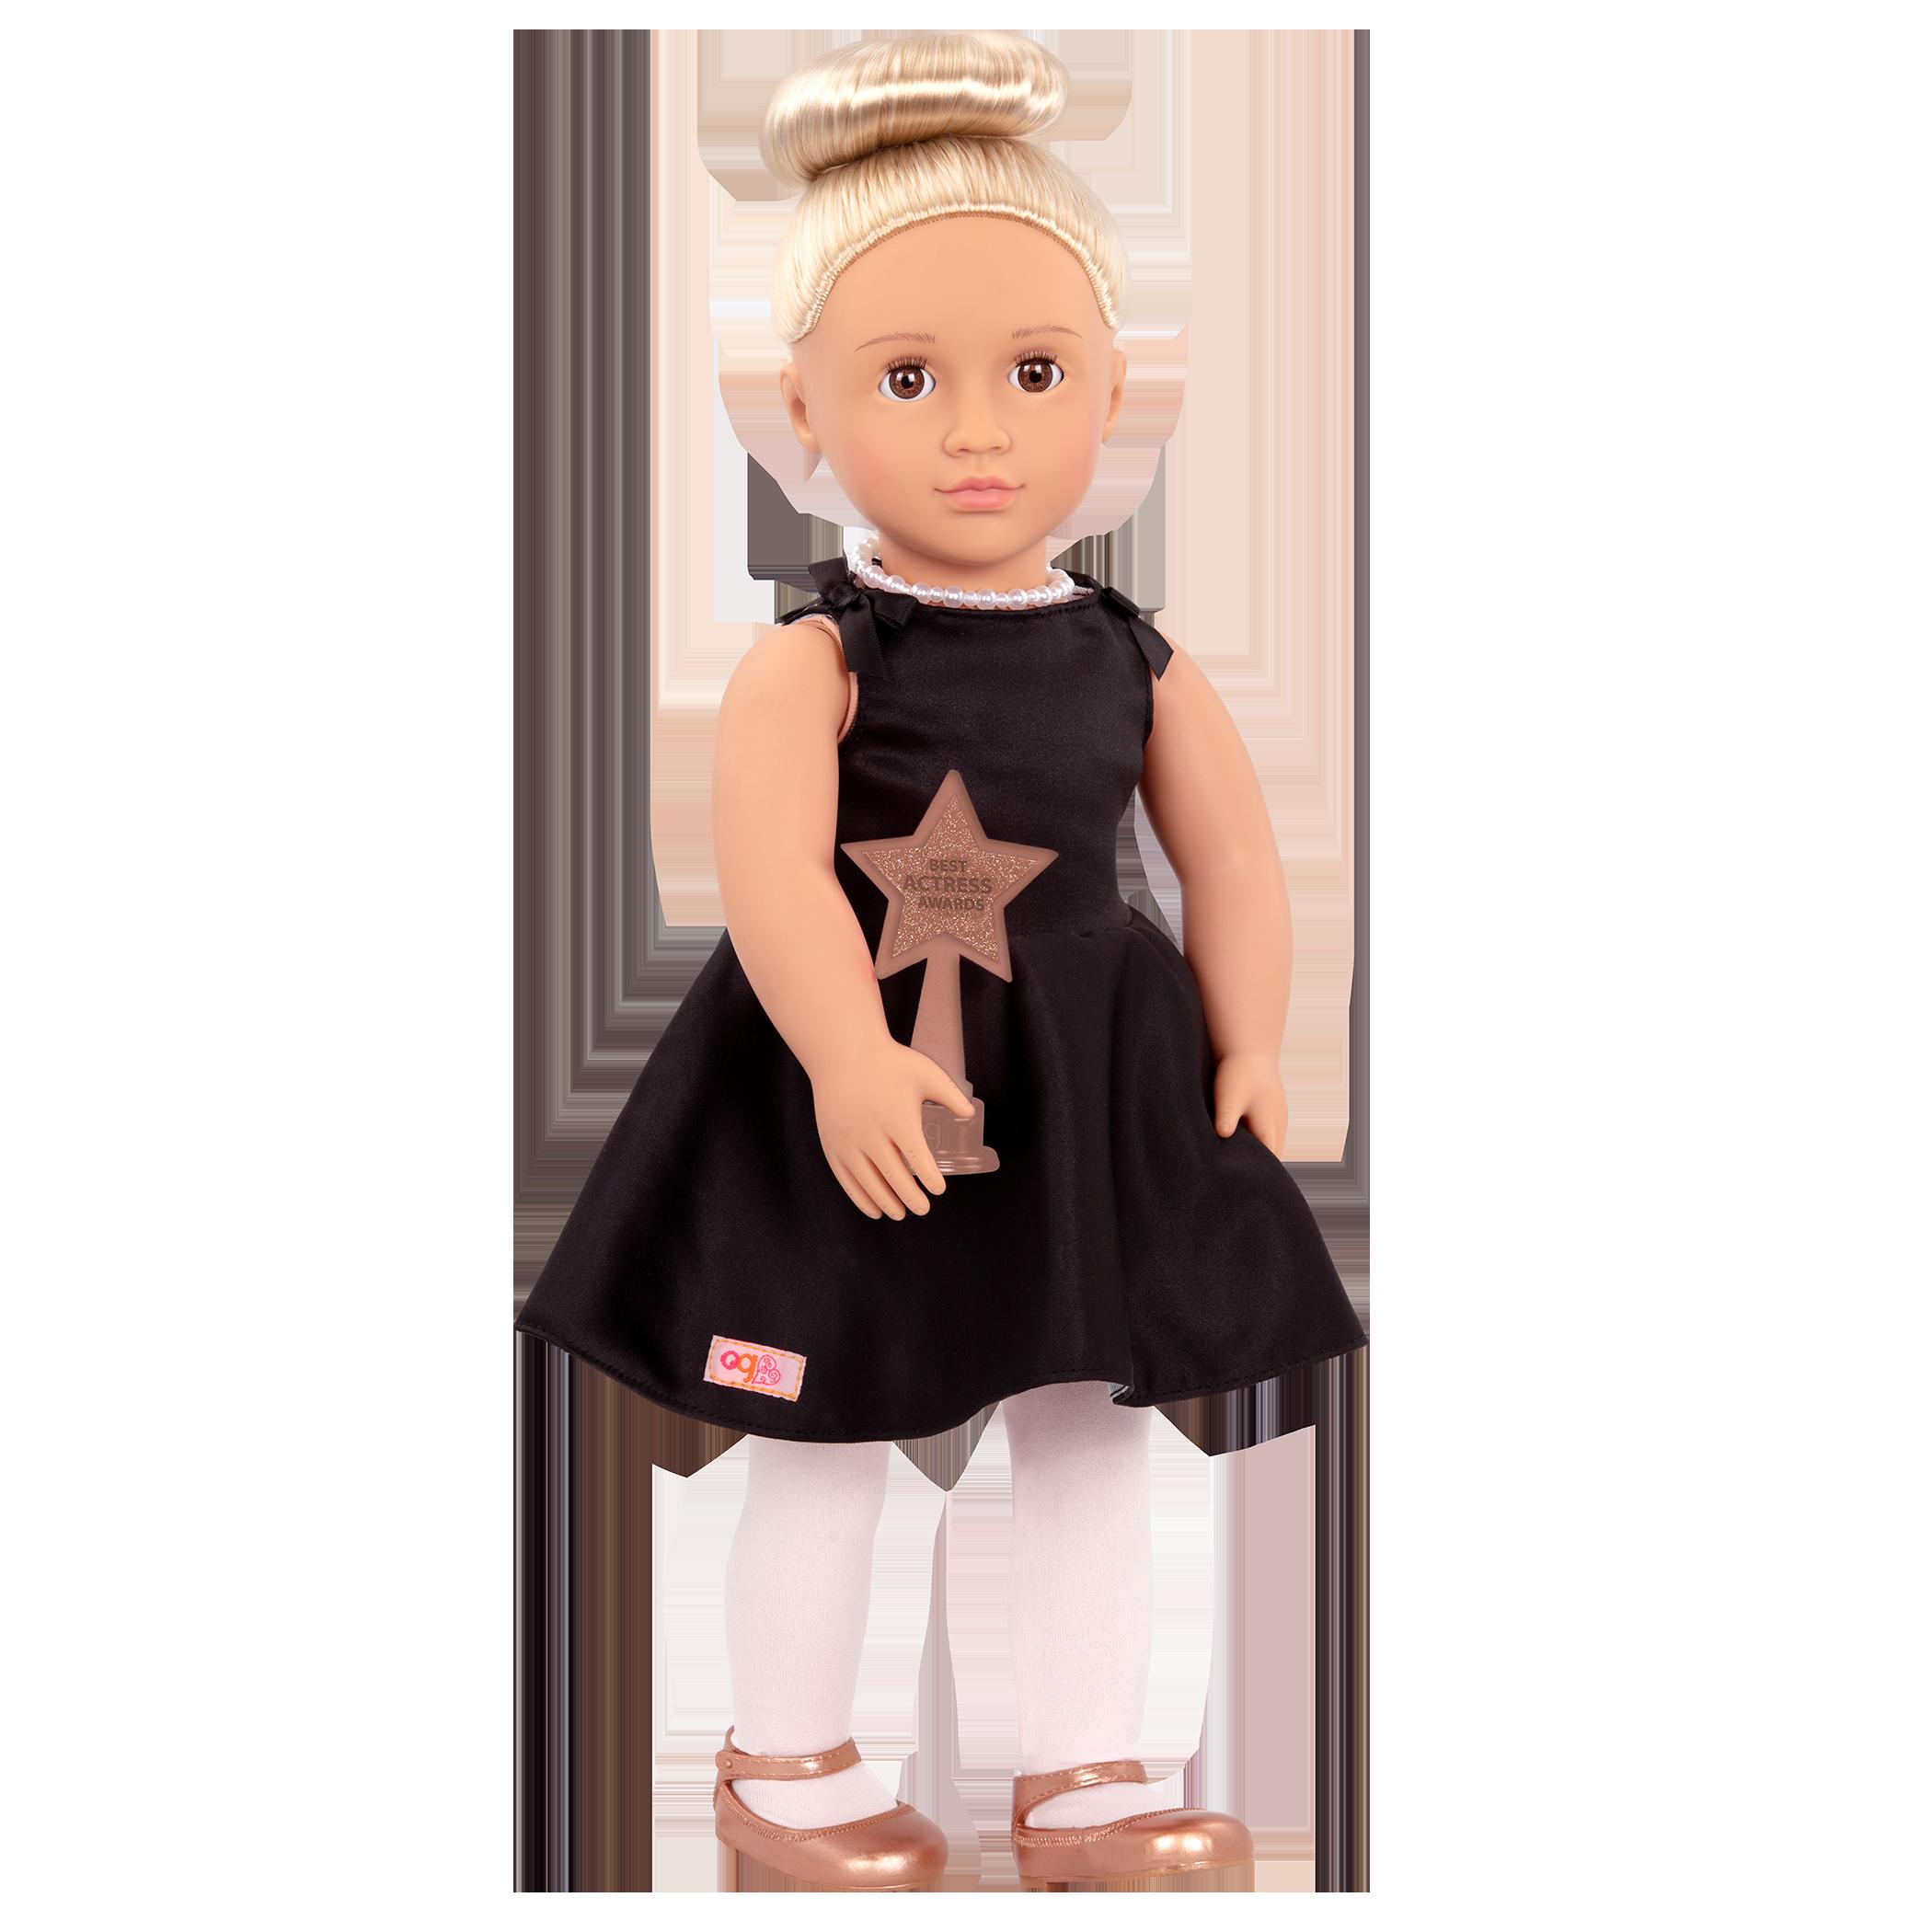 Rafaella Regular 18-inch Actress Doll holding award